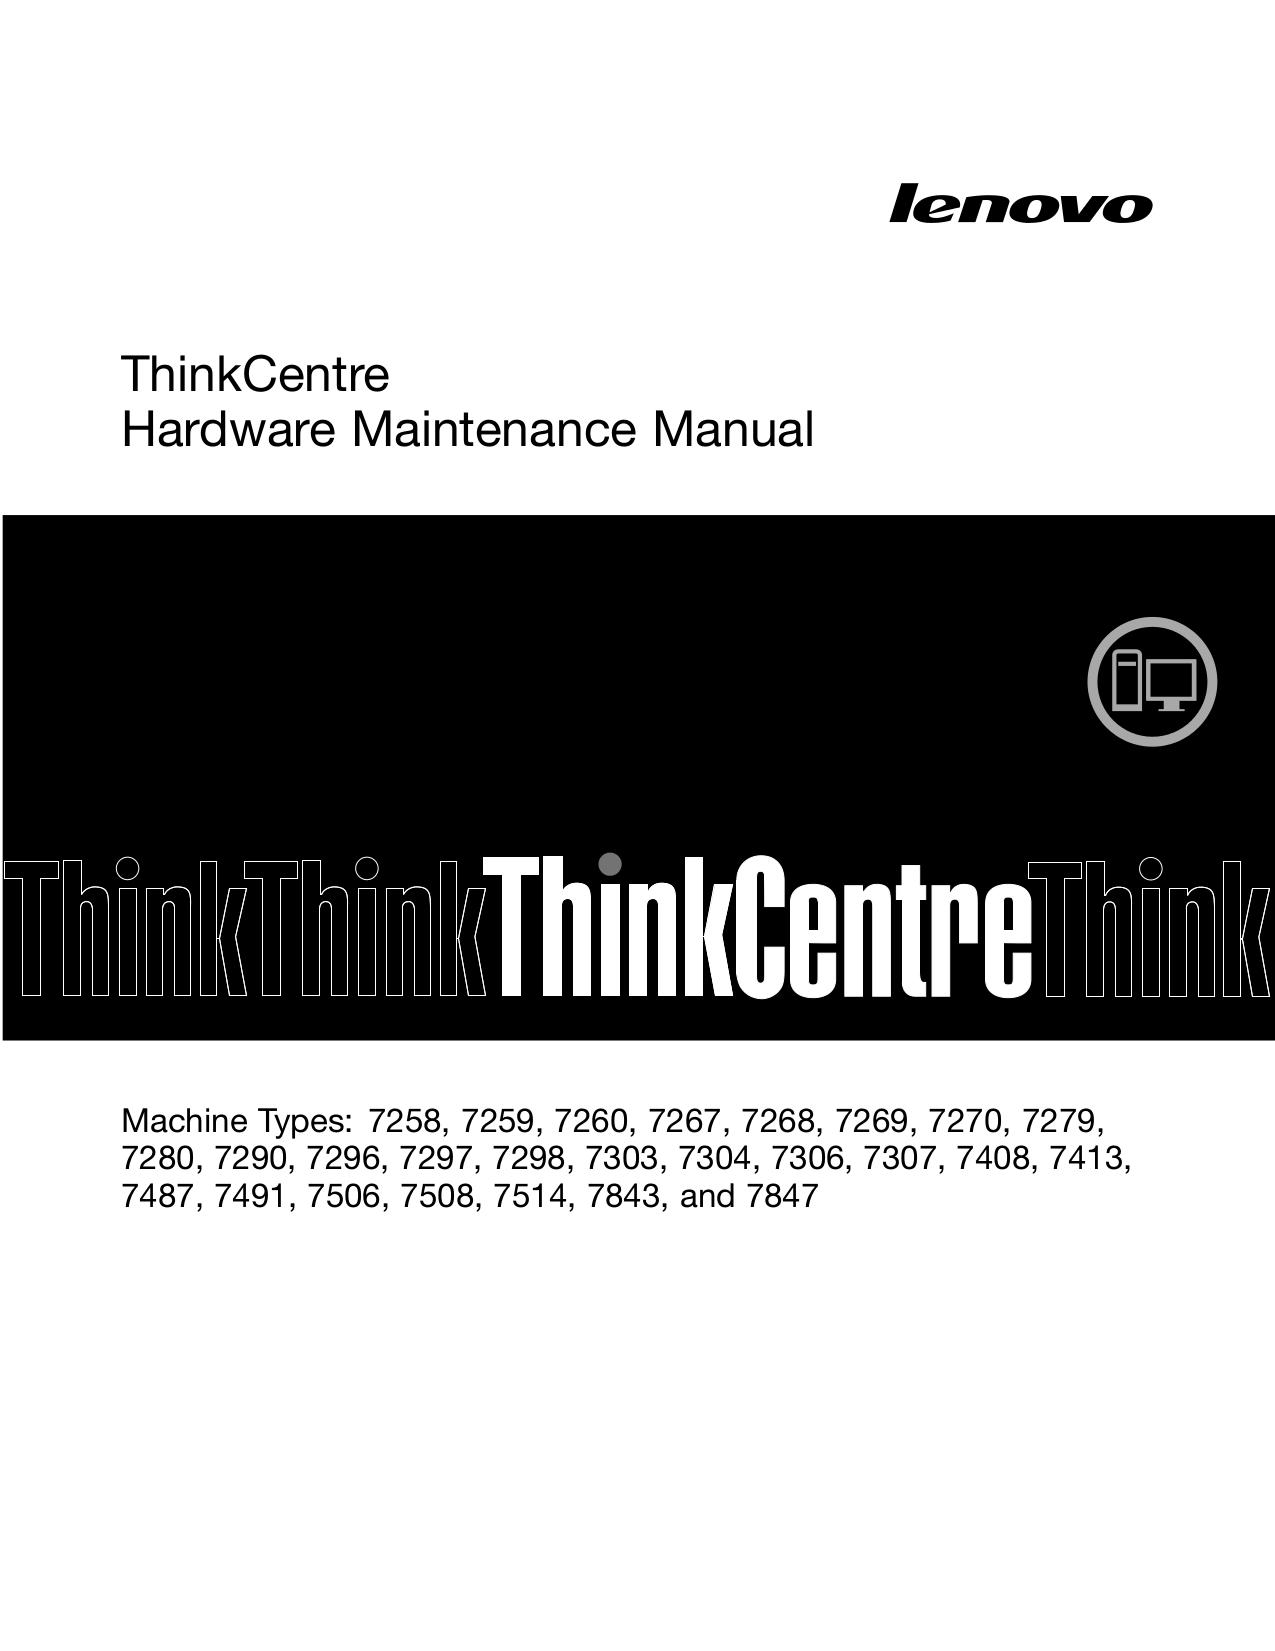 pdf for Lenovo Desktop ThinkCentre M58e 7847 manual